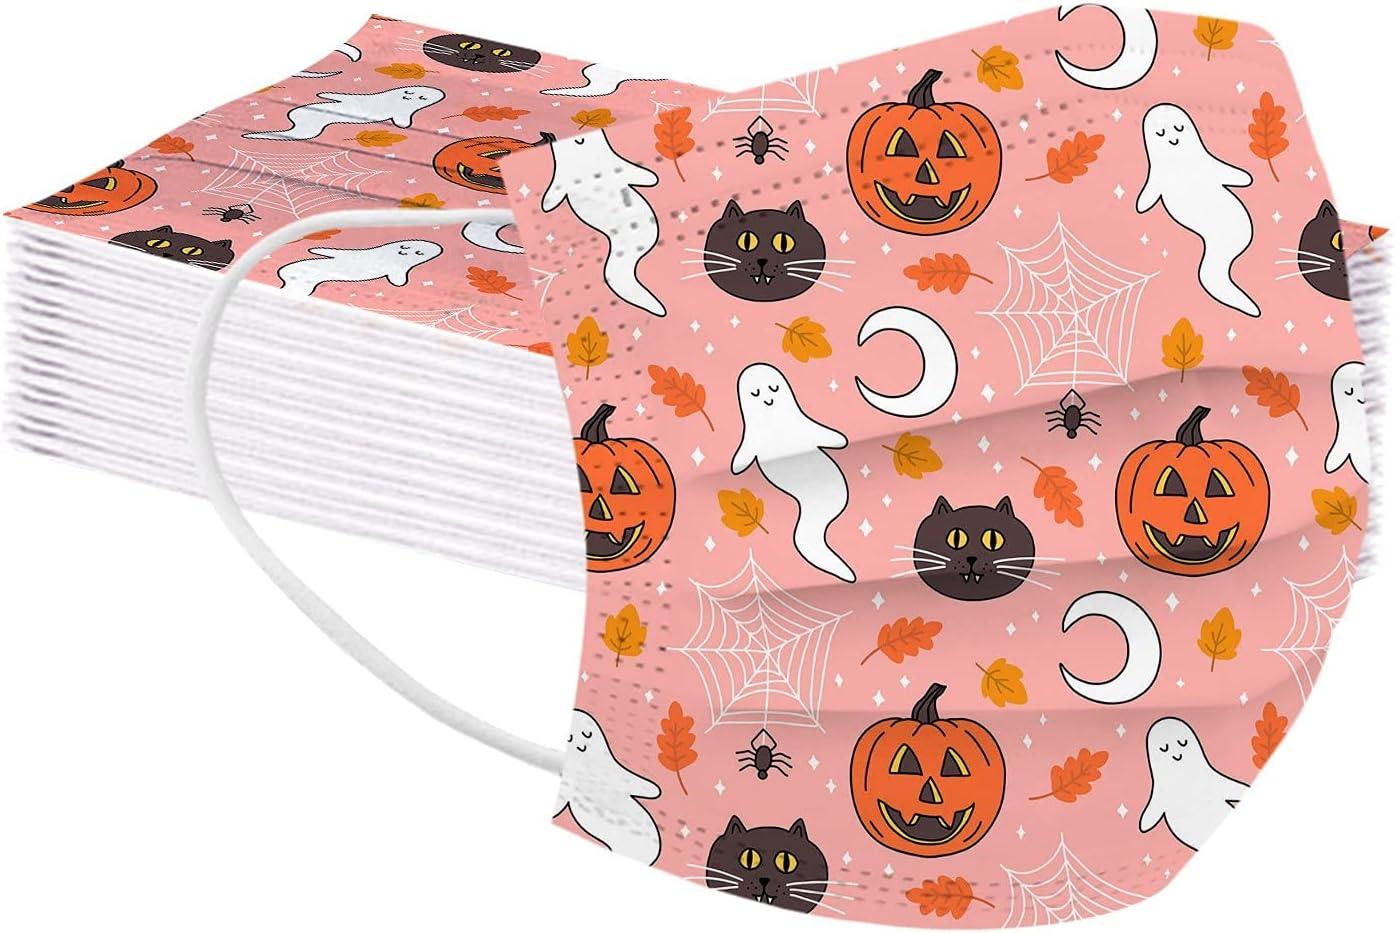 50 Cheap bargain Pcs Kids Disposable Face_Masks San Diego Mall Facemasks Printed f Halloween